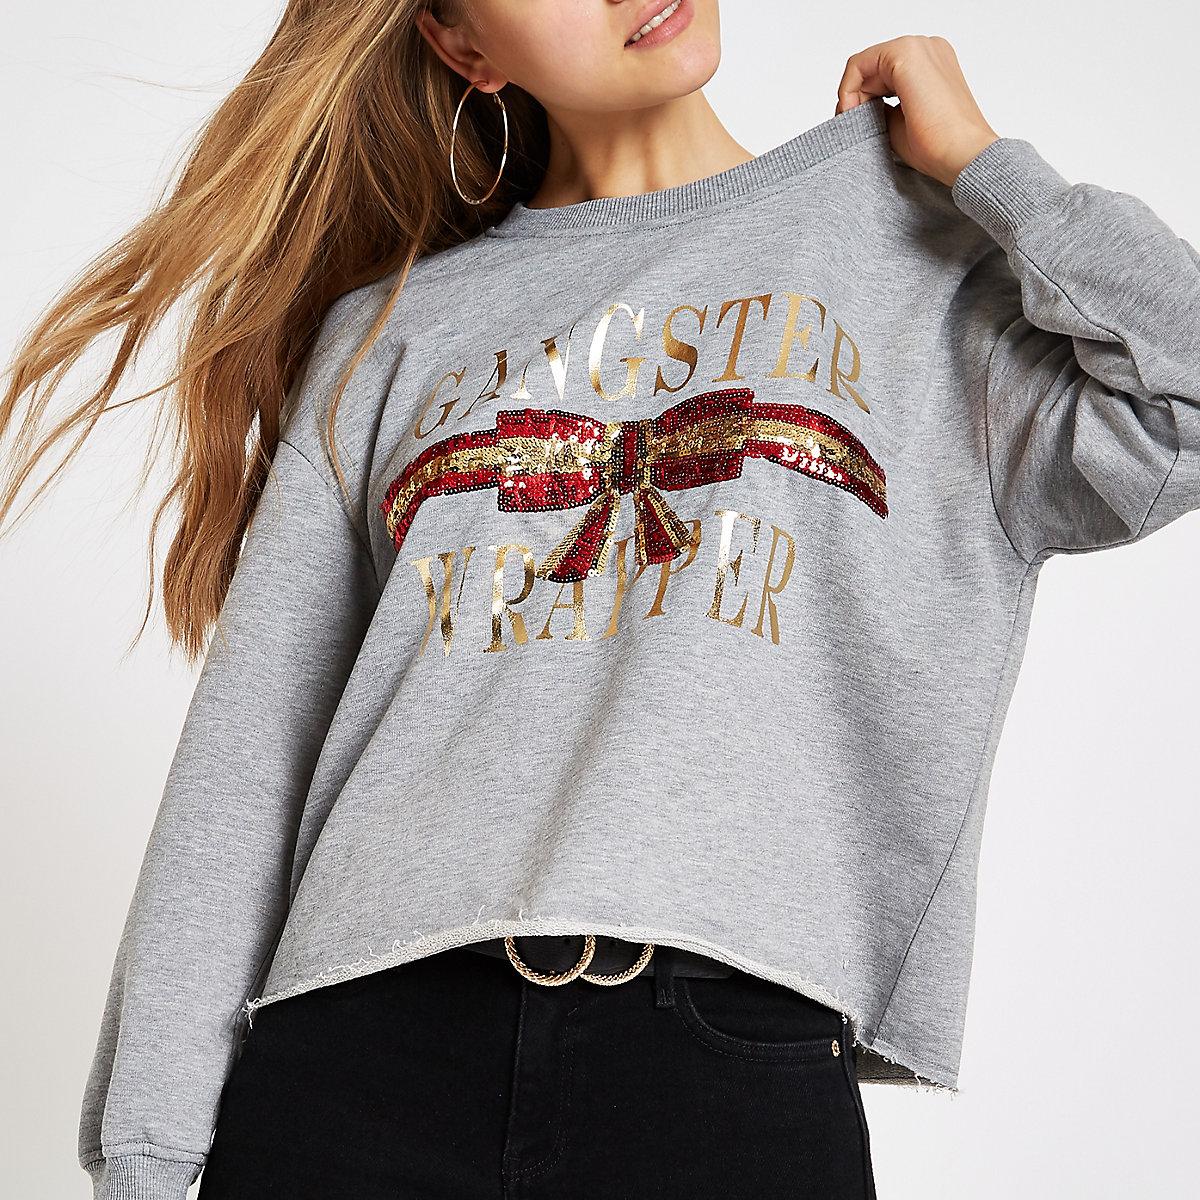 Grey 'Gangster wrapper' Christmas sweatshirt